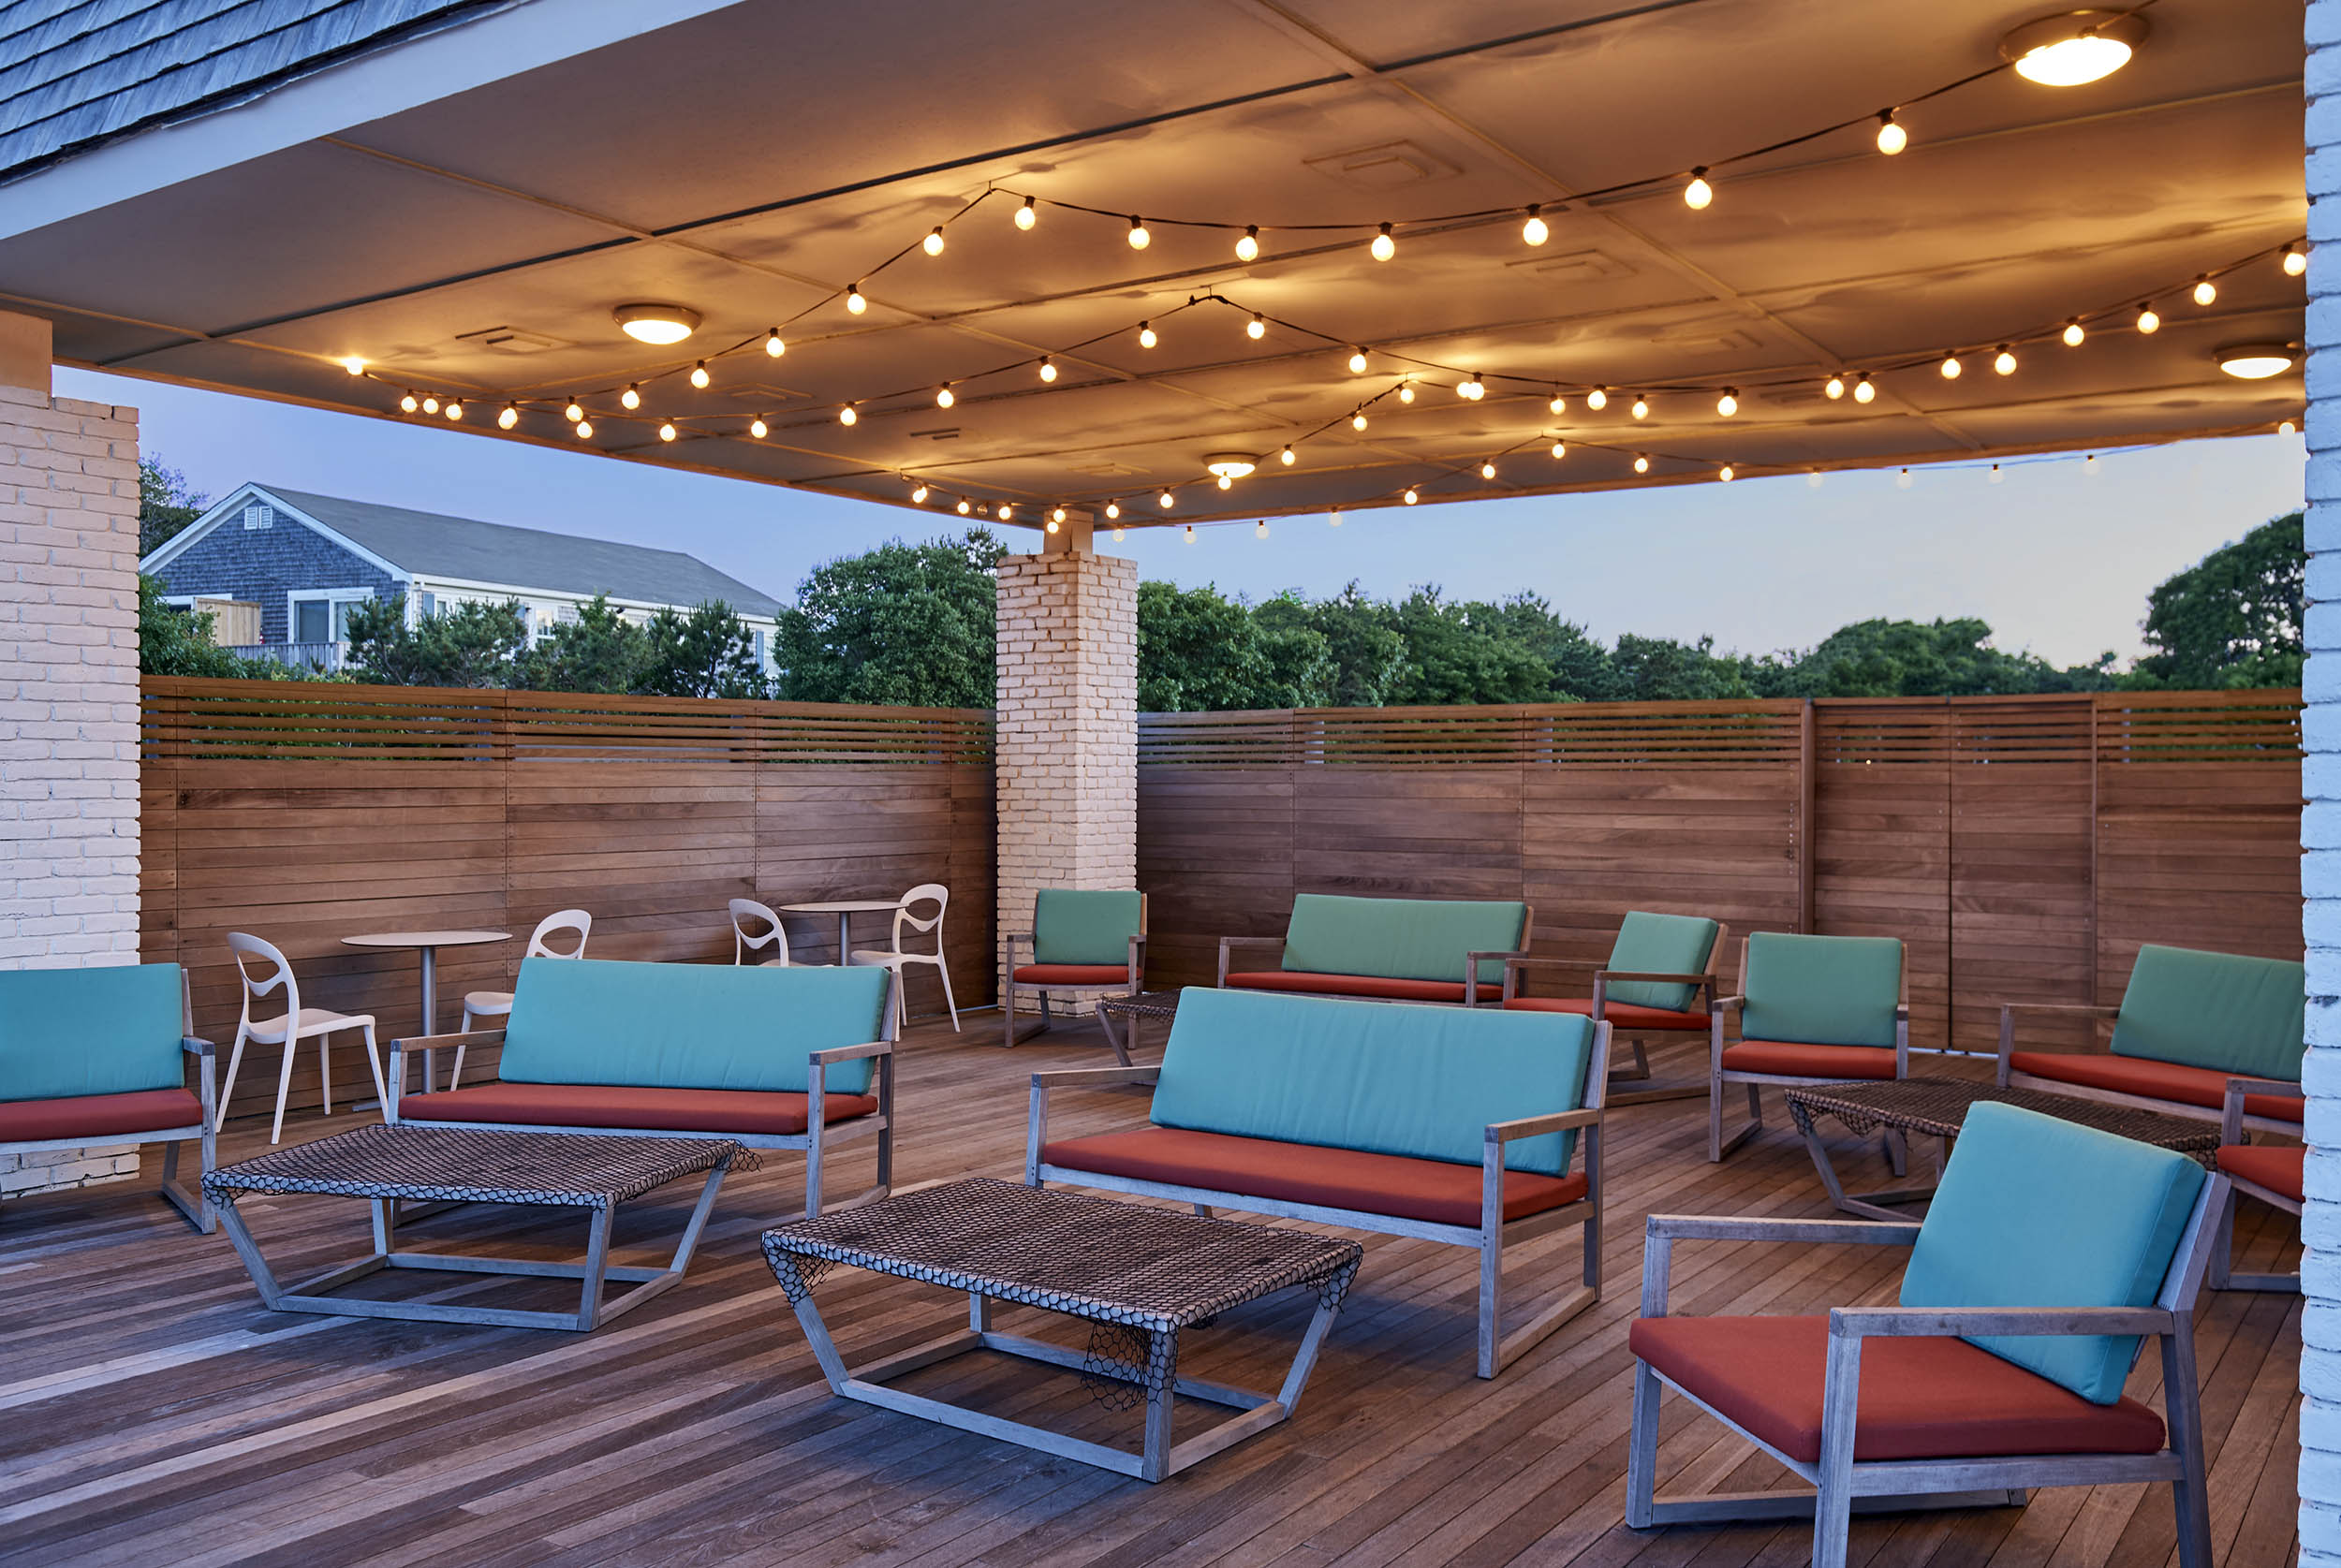 HH_outdoor_lounge_160603_10945.jpg